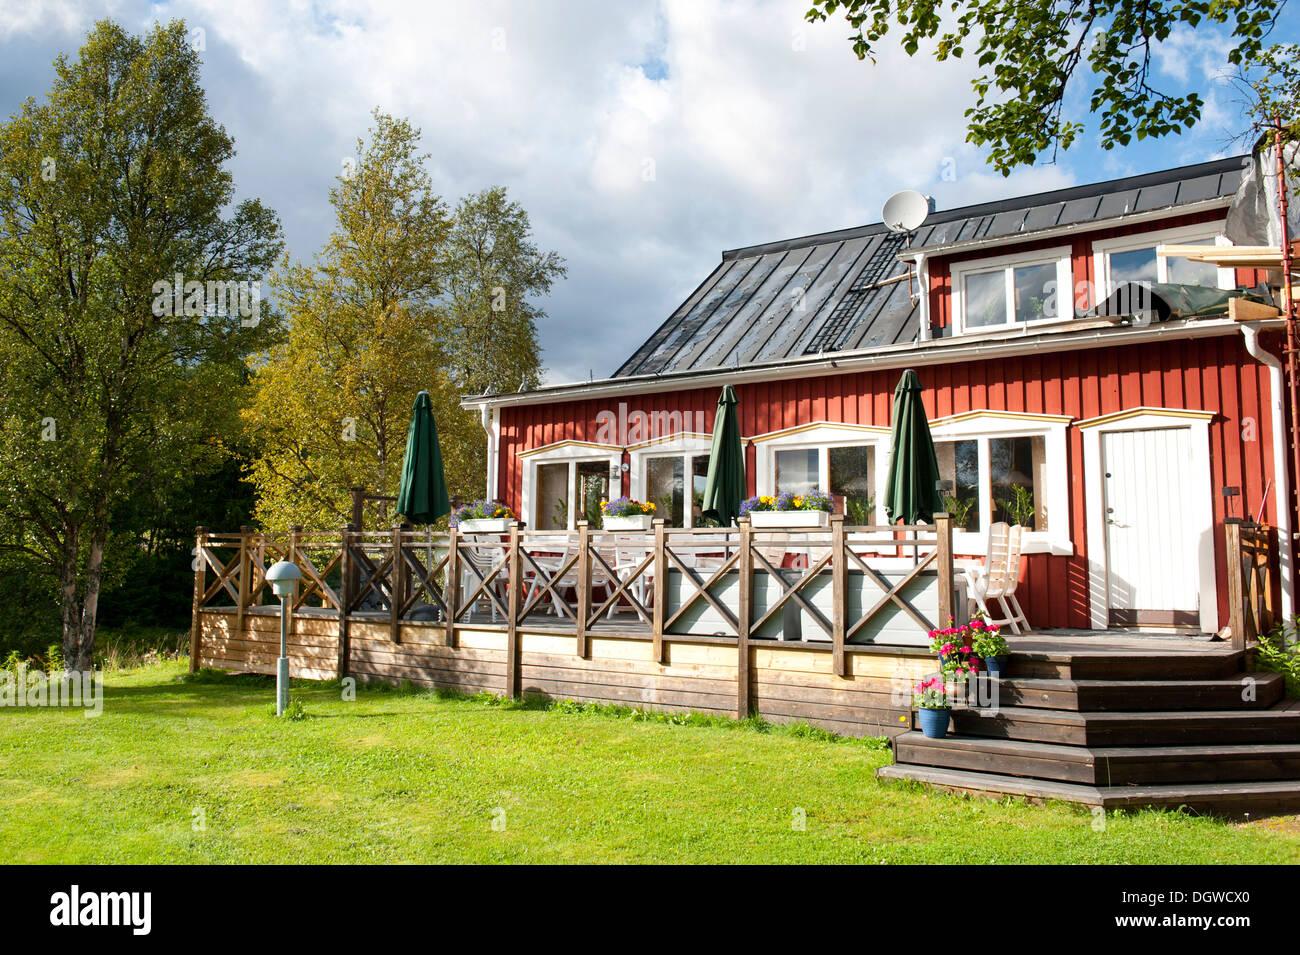 Terrace, garden, Storsaetra Fjaellhotell Hotel, near Groevelsjoen, Dalarna province, Sweden, Scandinavia, Northern Europe - Stock Image